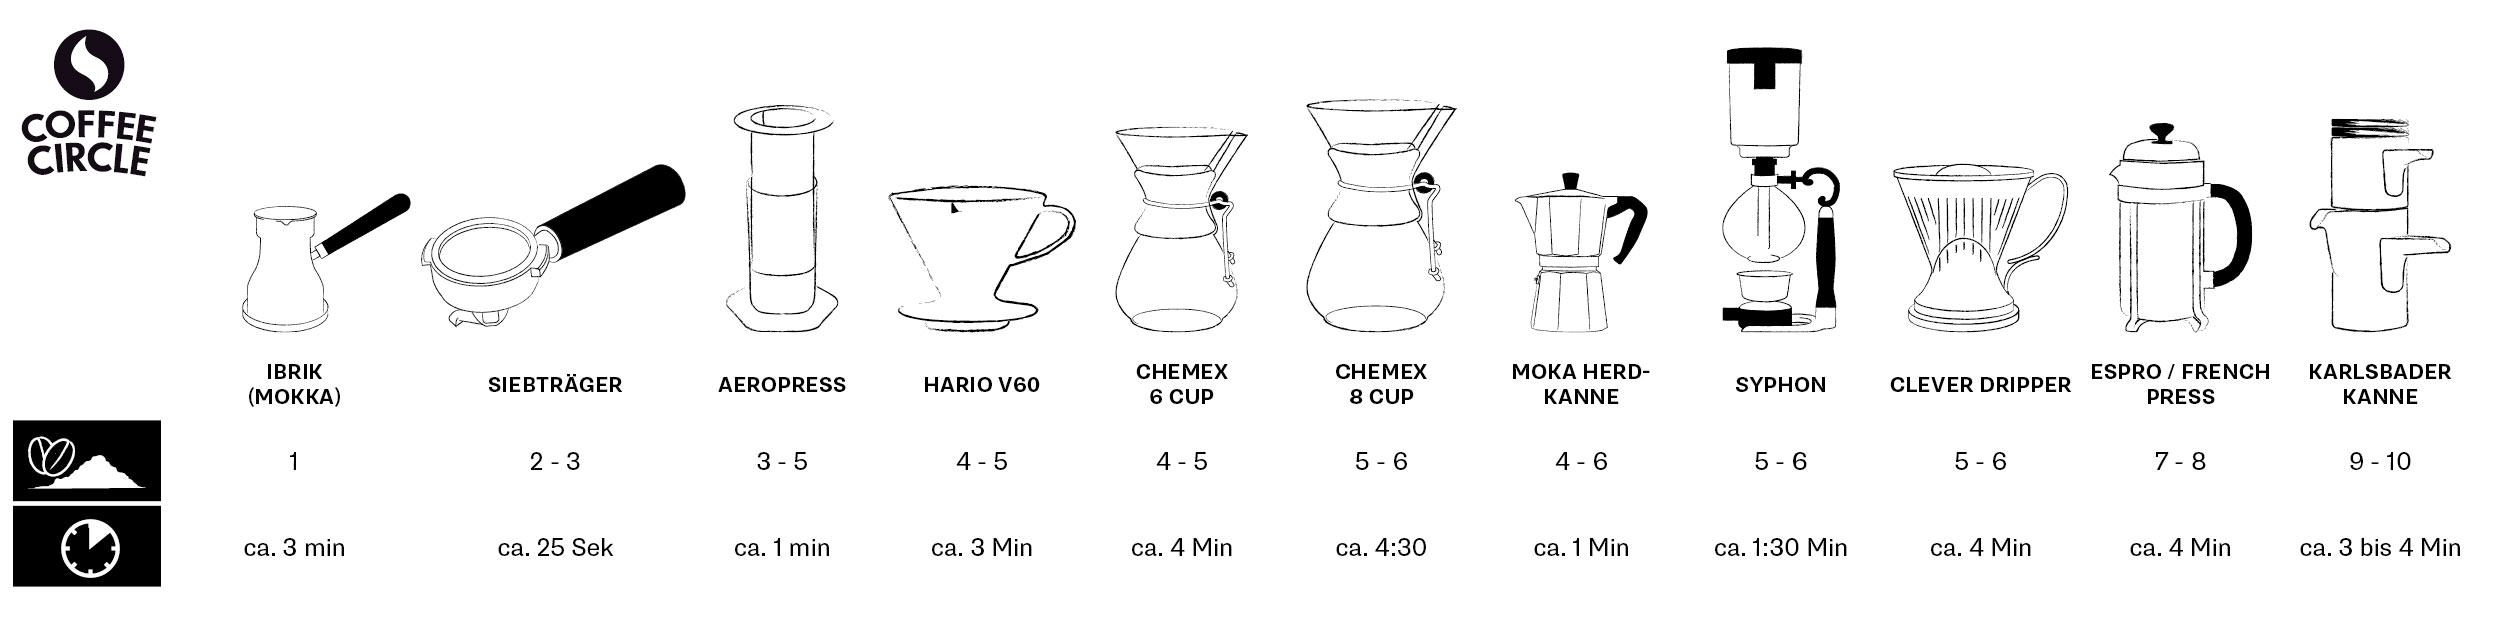 optimaler mahlgrad und zeit beim kaffee 2500 625 infographics pinterest coffee. Black Bedroom Furniture Sets. Home Design Ideas